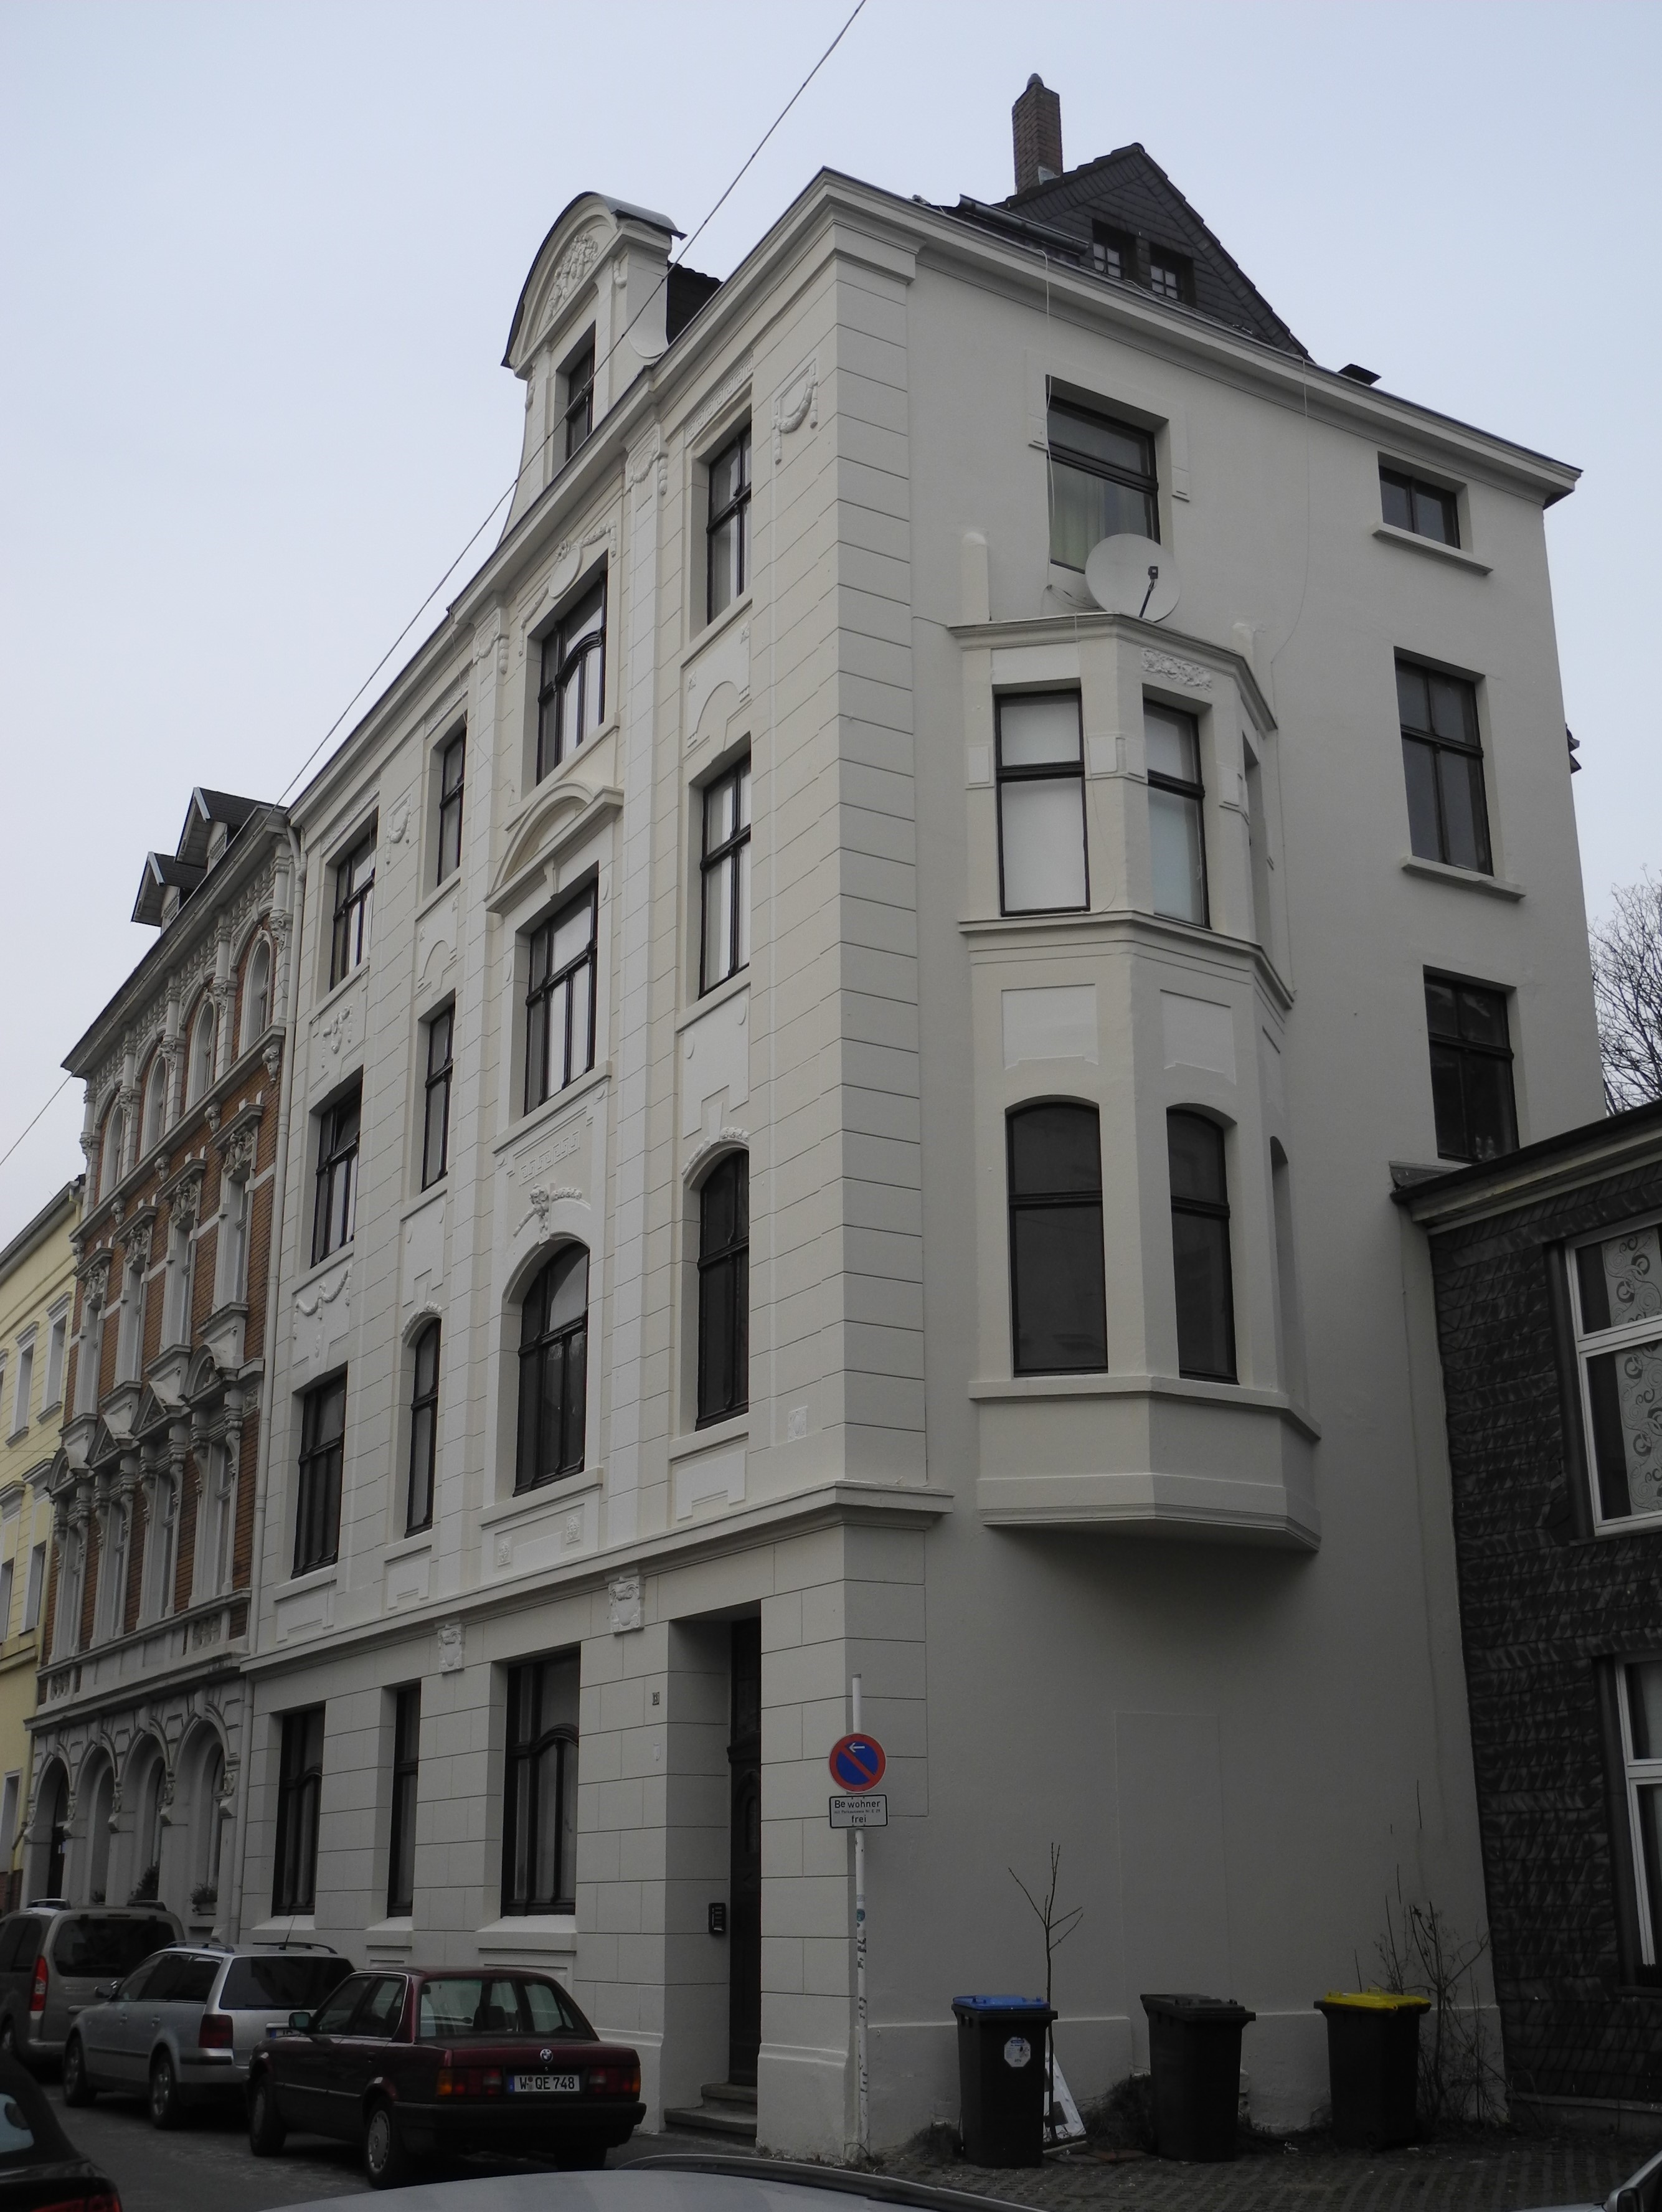 File:Wuppertal, Haarhausstr. 13, über Eck.jpg - Wikimedia Commons